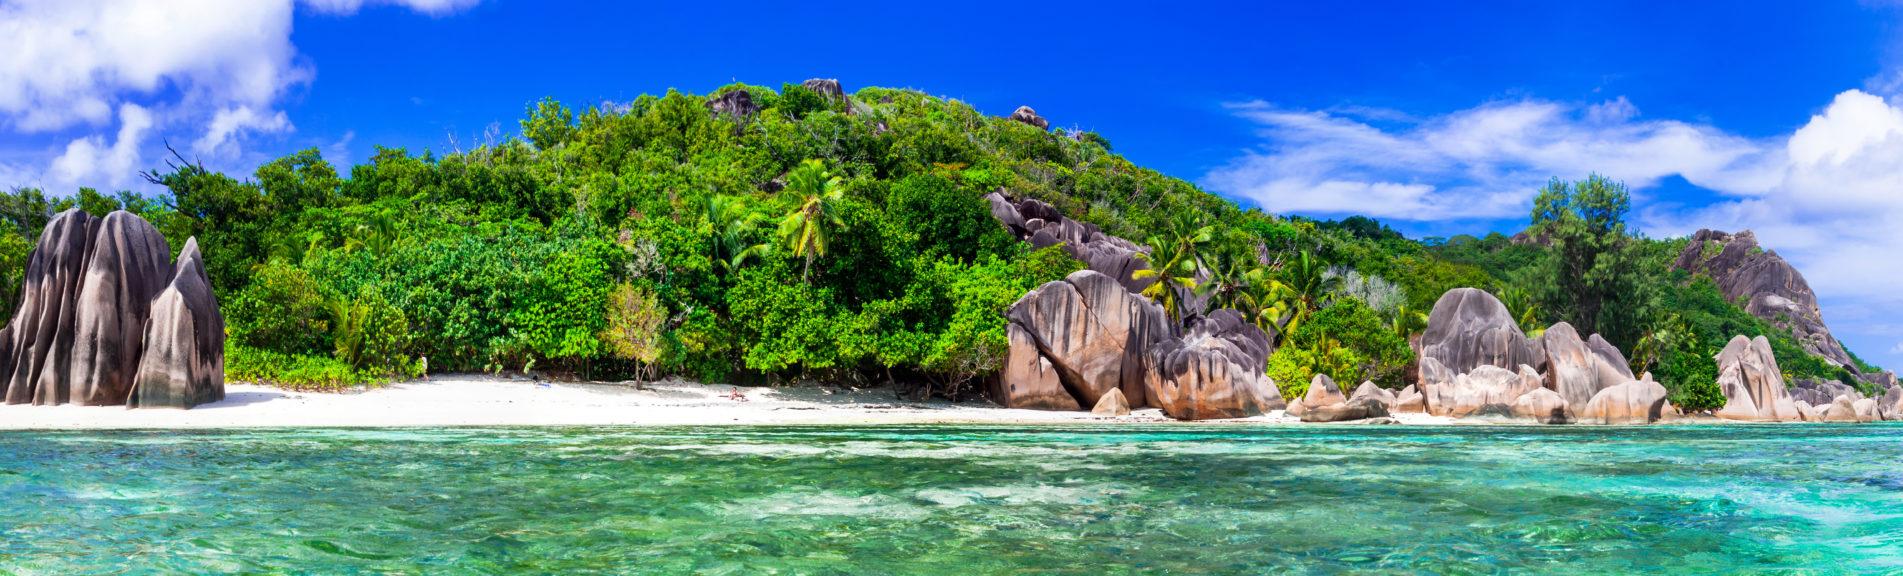 Most beautiful tropical beach